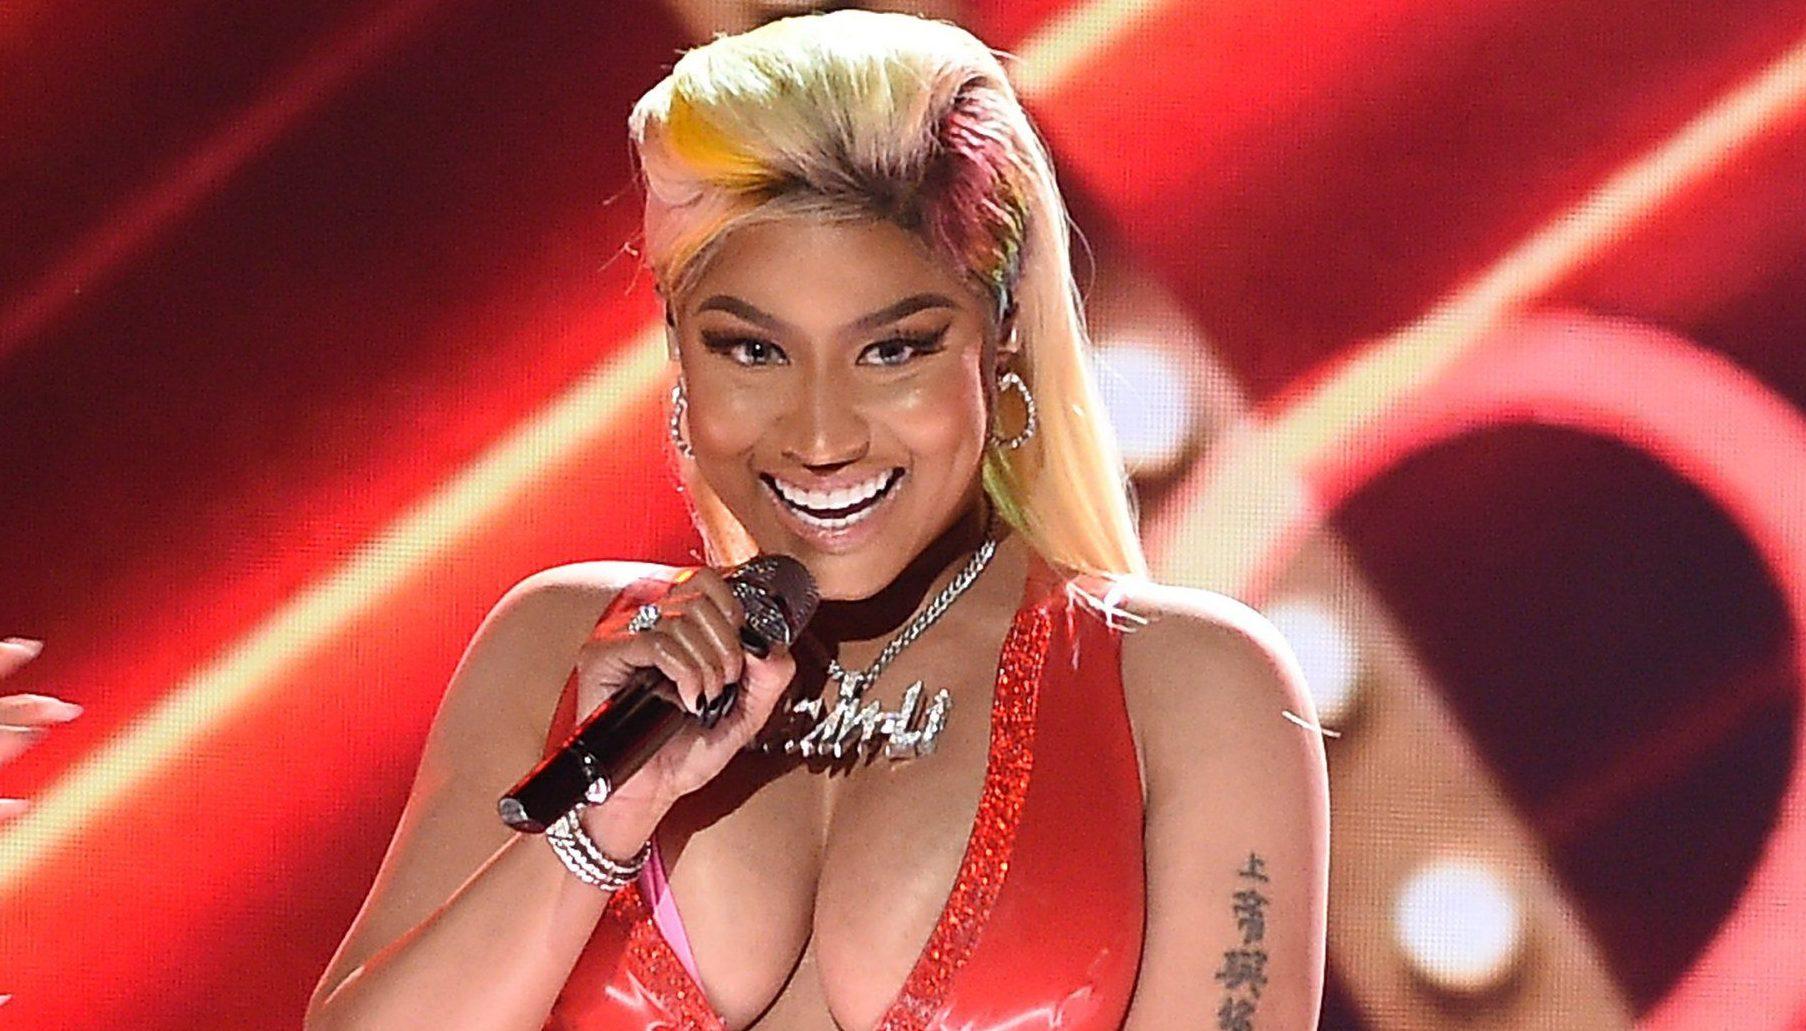 Mandatory Credit: Photo by Frank Micelotta/PictureGroup/REX/Shutterstock (9726415bm) Nicki Minaj BET Awards, Show, Los Angeles, USA - 24 Jun 2018